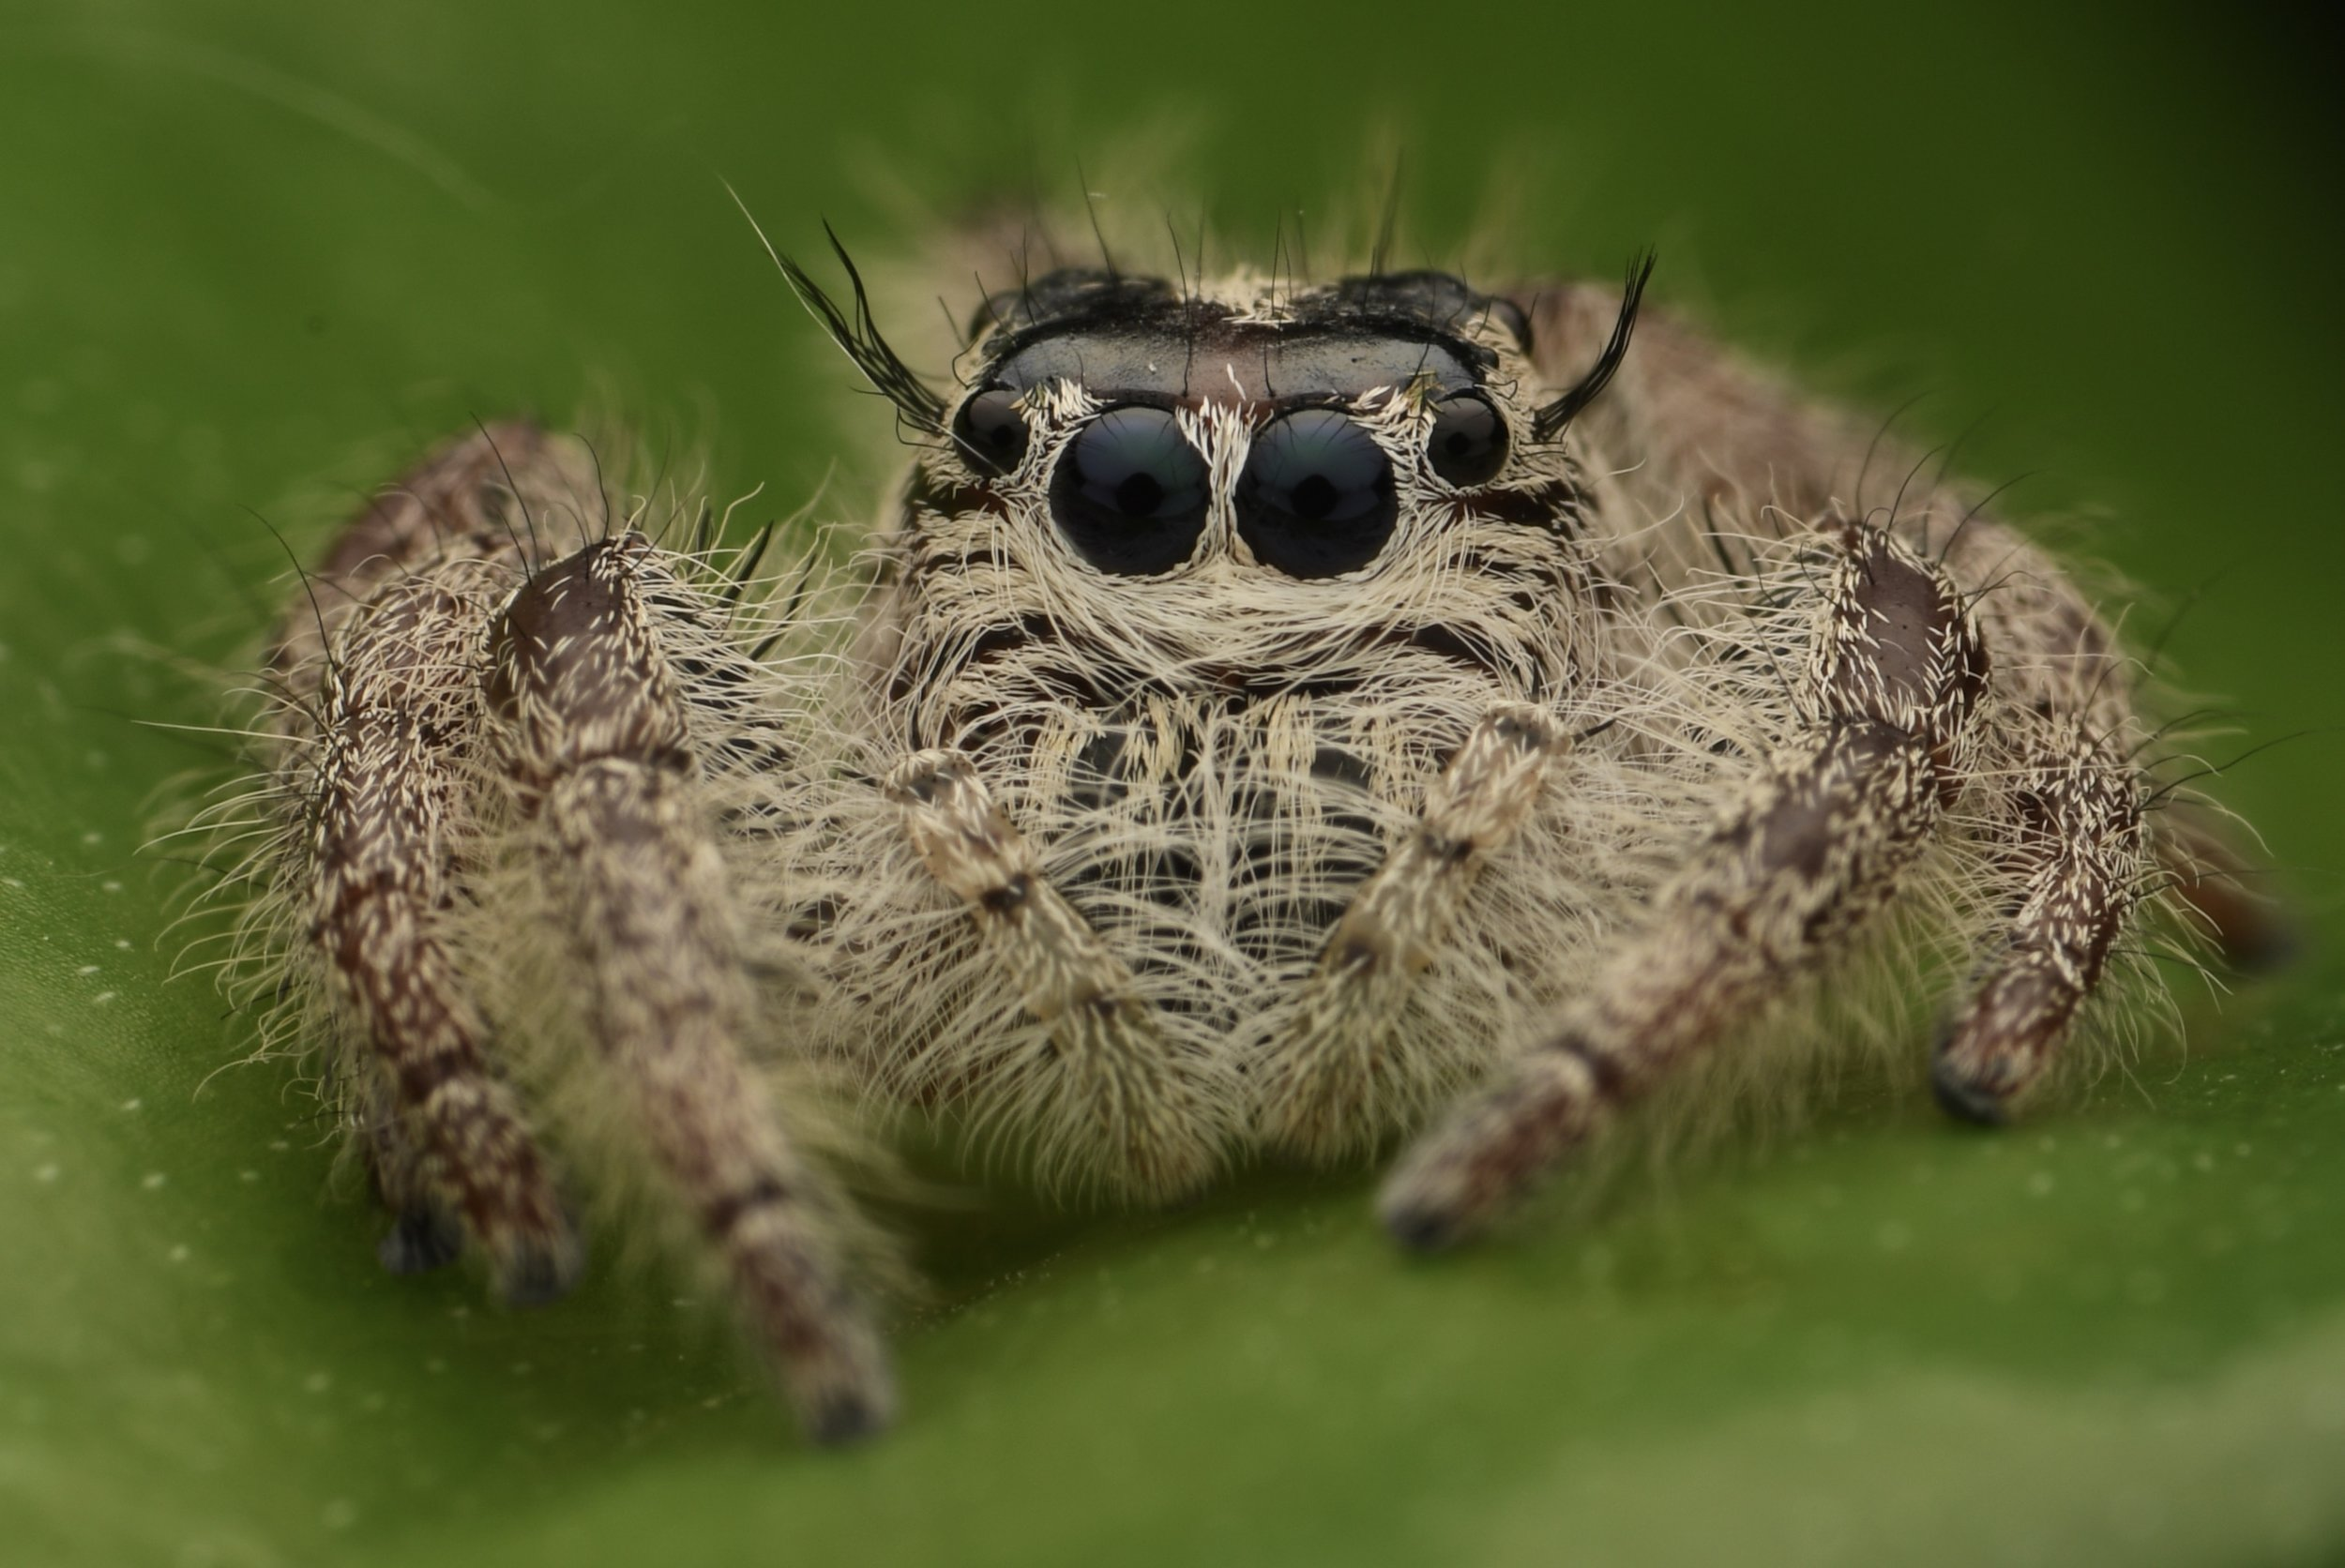 Heavy Jumping Spider ( Hyllus diardi ),   Tanjung Rhu, Langkawi Island, Malaysia  • Nikon D500, Tokina 100mm f/2,8 macro with Raynox DCR-250, Nikon SB900 @ 1/8 power with Alex Goh Macro Diffuser, ISO100, f/22, 1/60s